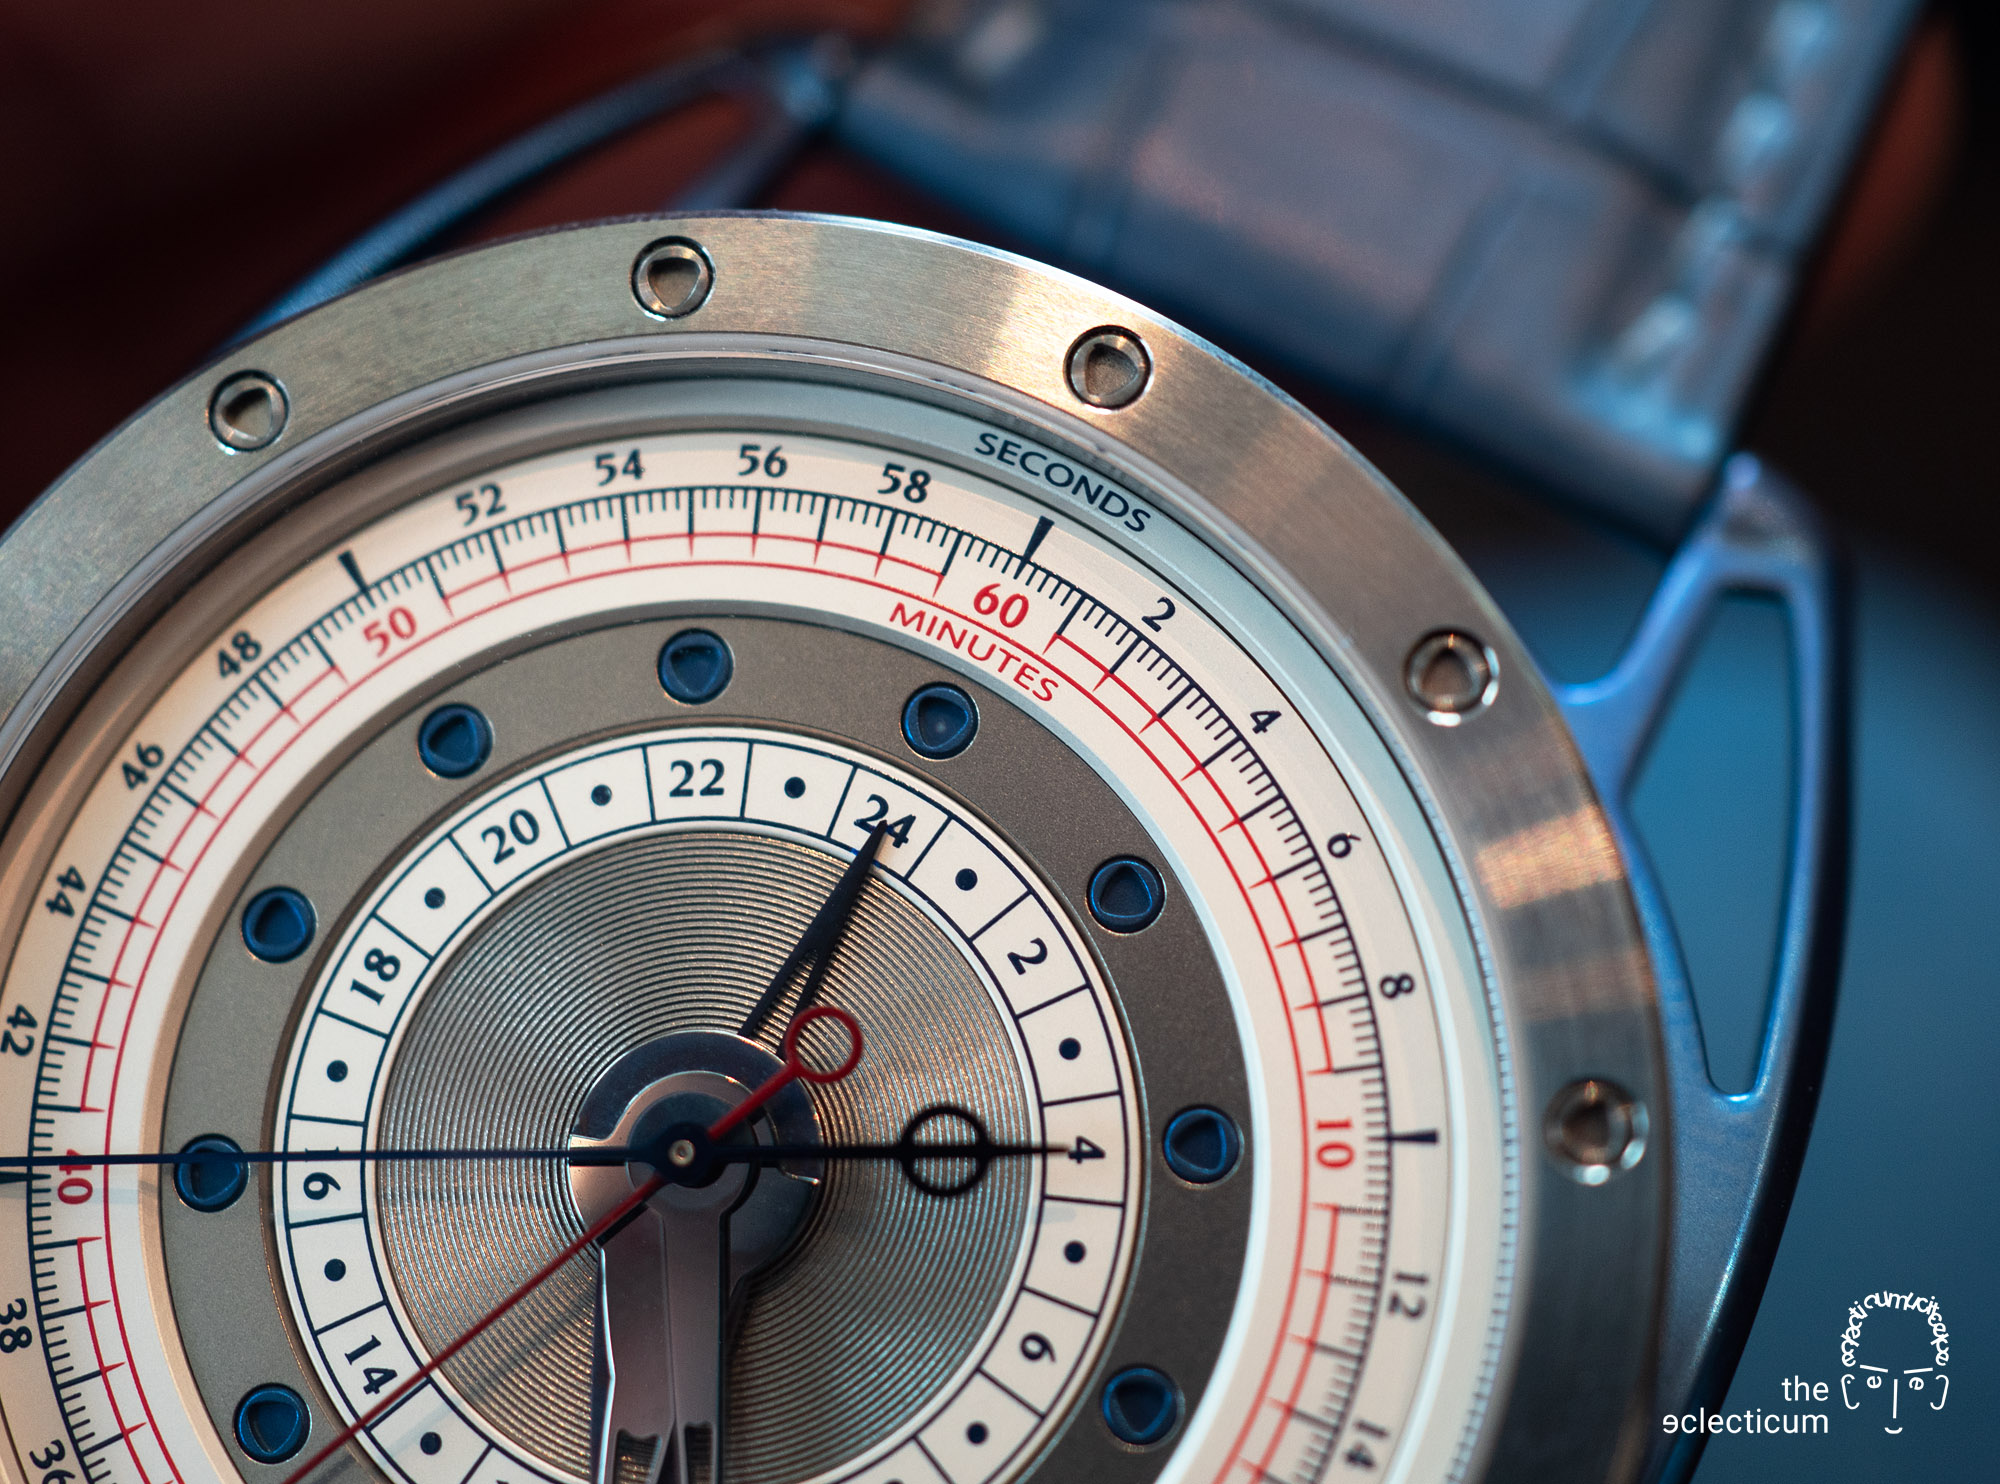 De Bethune DB21RE MaxiChrono Reedition chronograph central stack manufacture dial